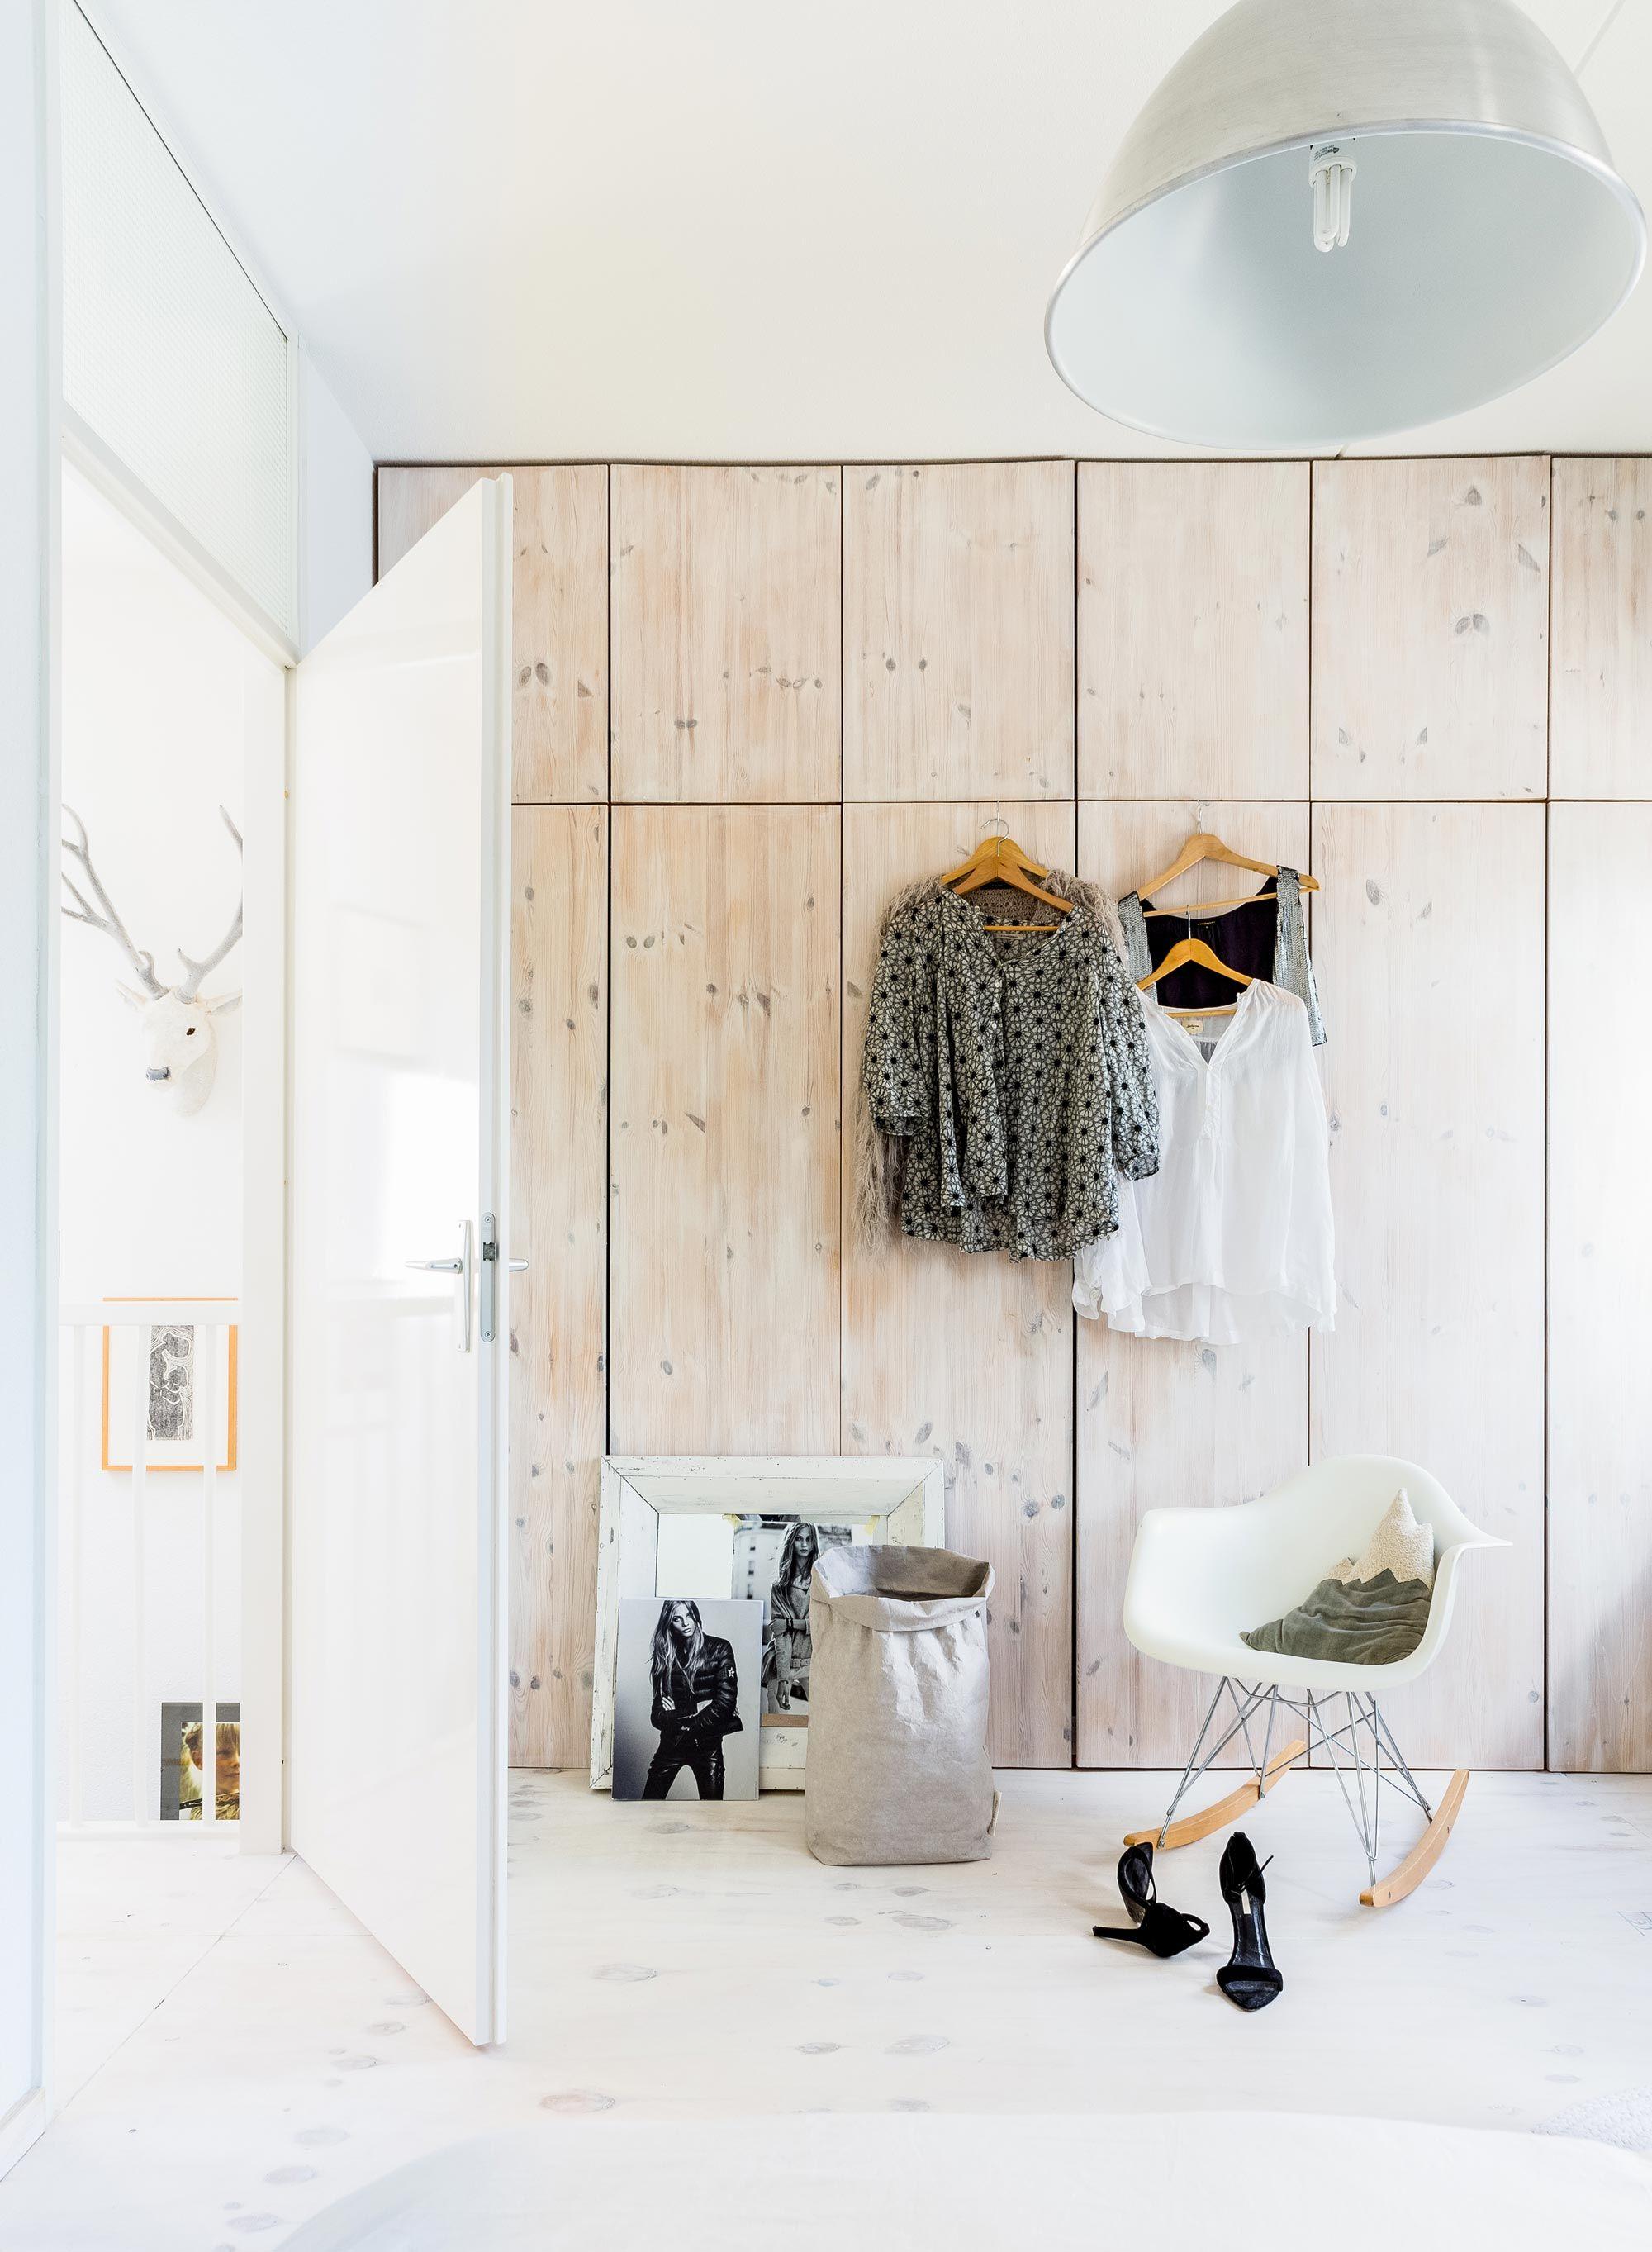 opbergruimte creëren - Kasten | Pinterest - Slaapkamer, Kasten en ...